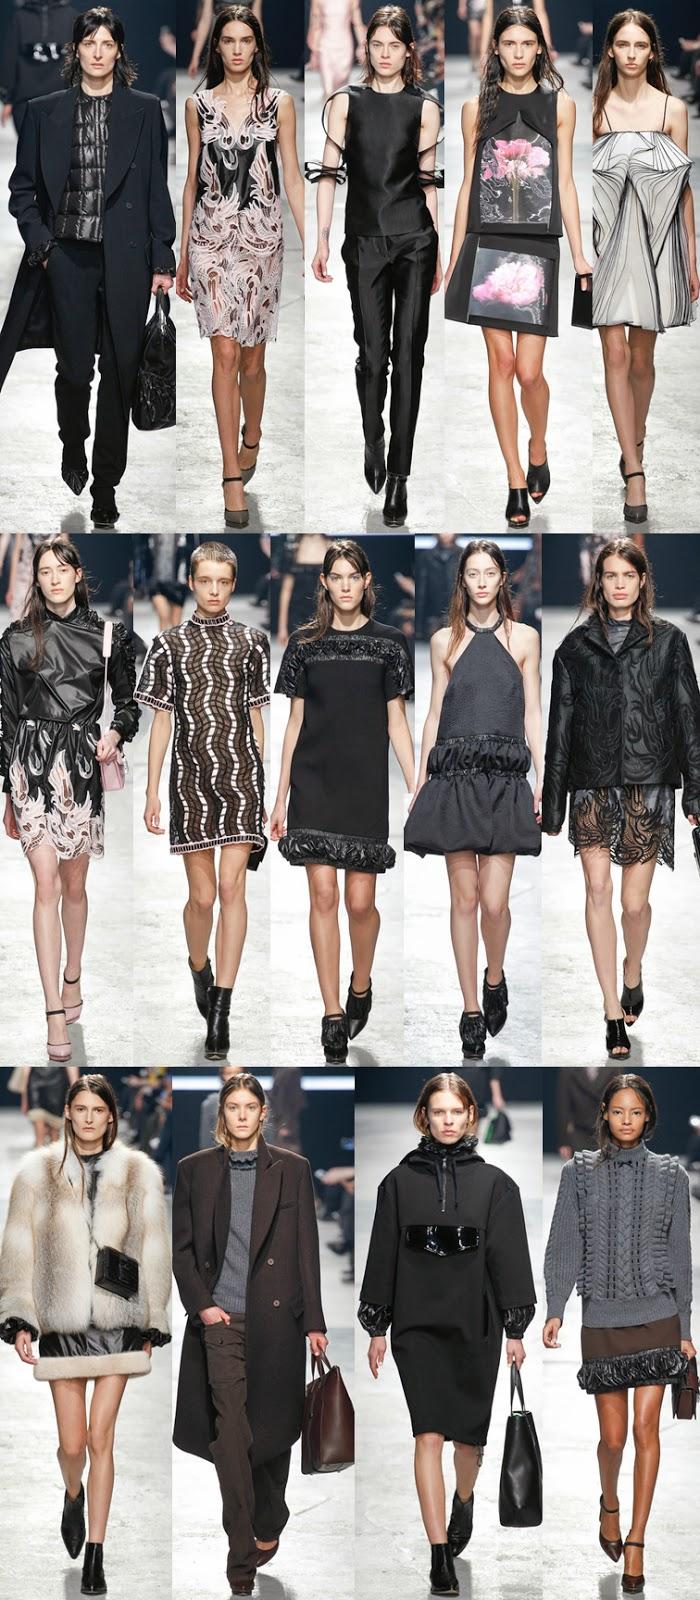 Christopher Kane fall winter 2014 runway collection, FW14, AW14, LFW, London fashion week